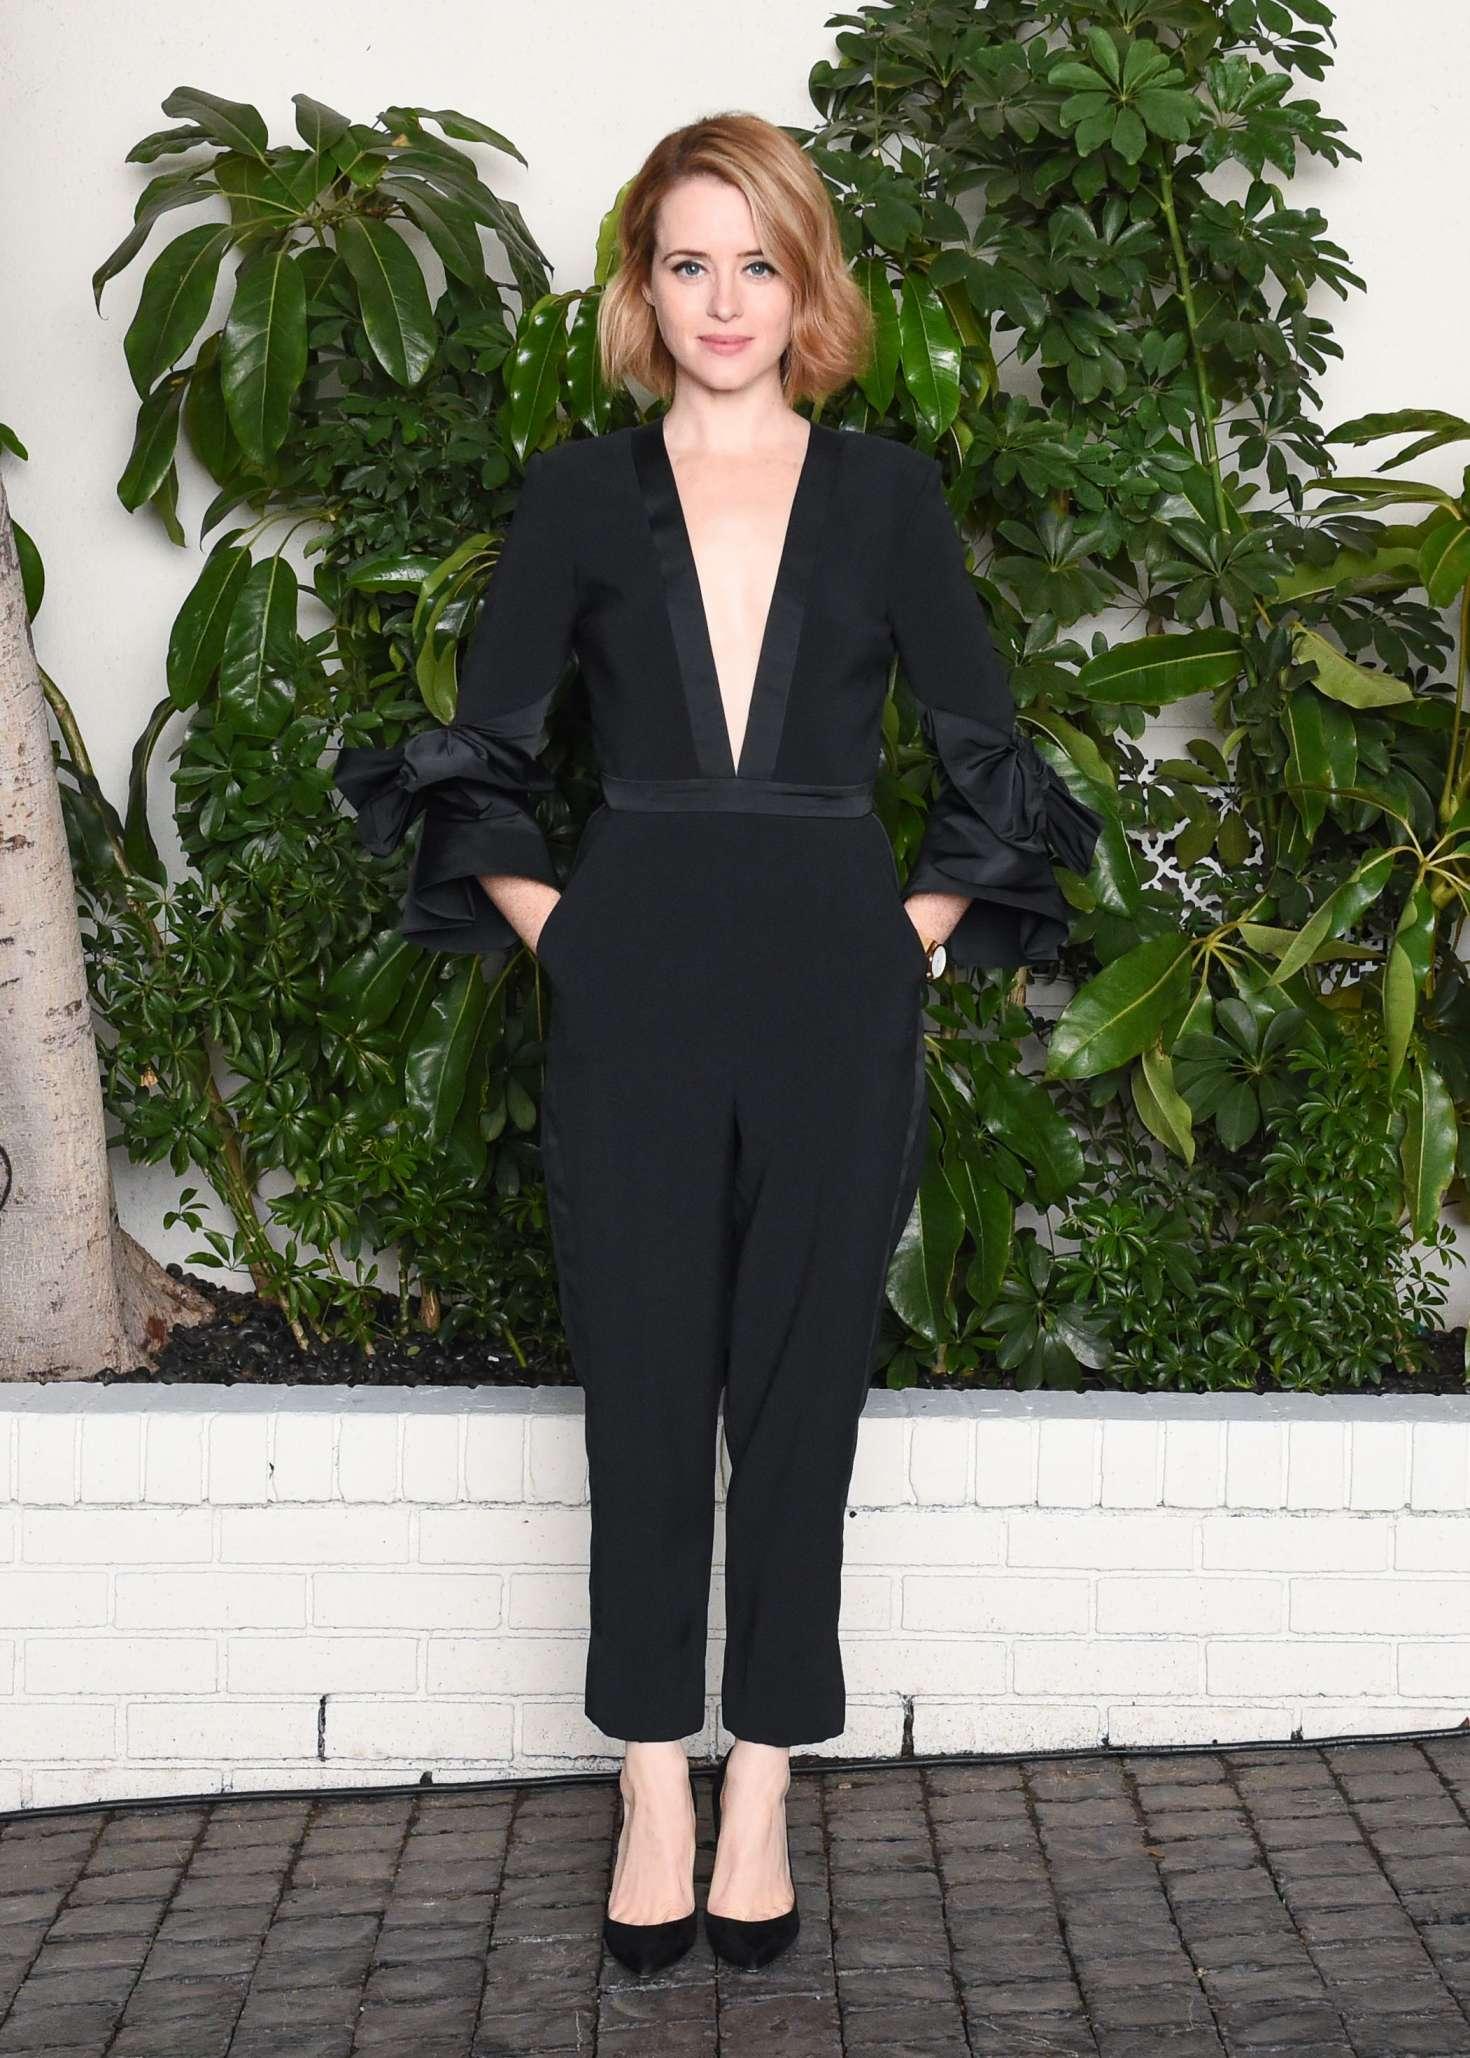 Claire Foy - W Magazine Celebrates Best Performances Portfolio & Golden Globes in LA